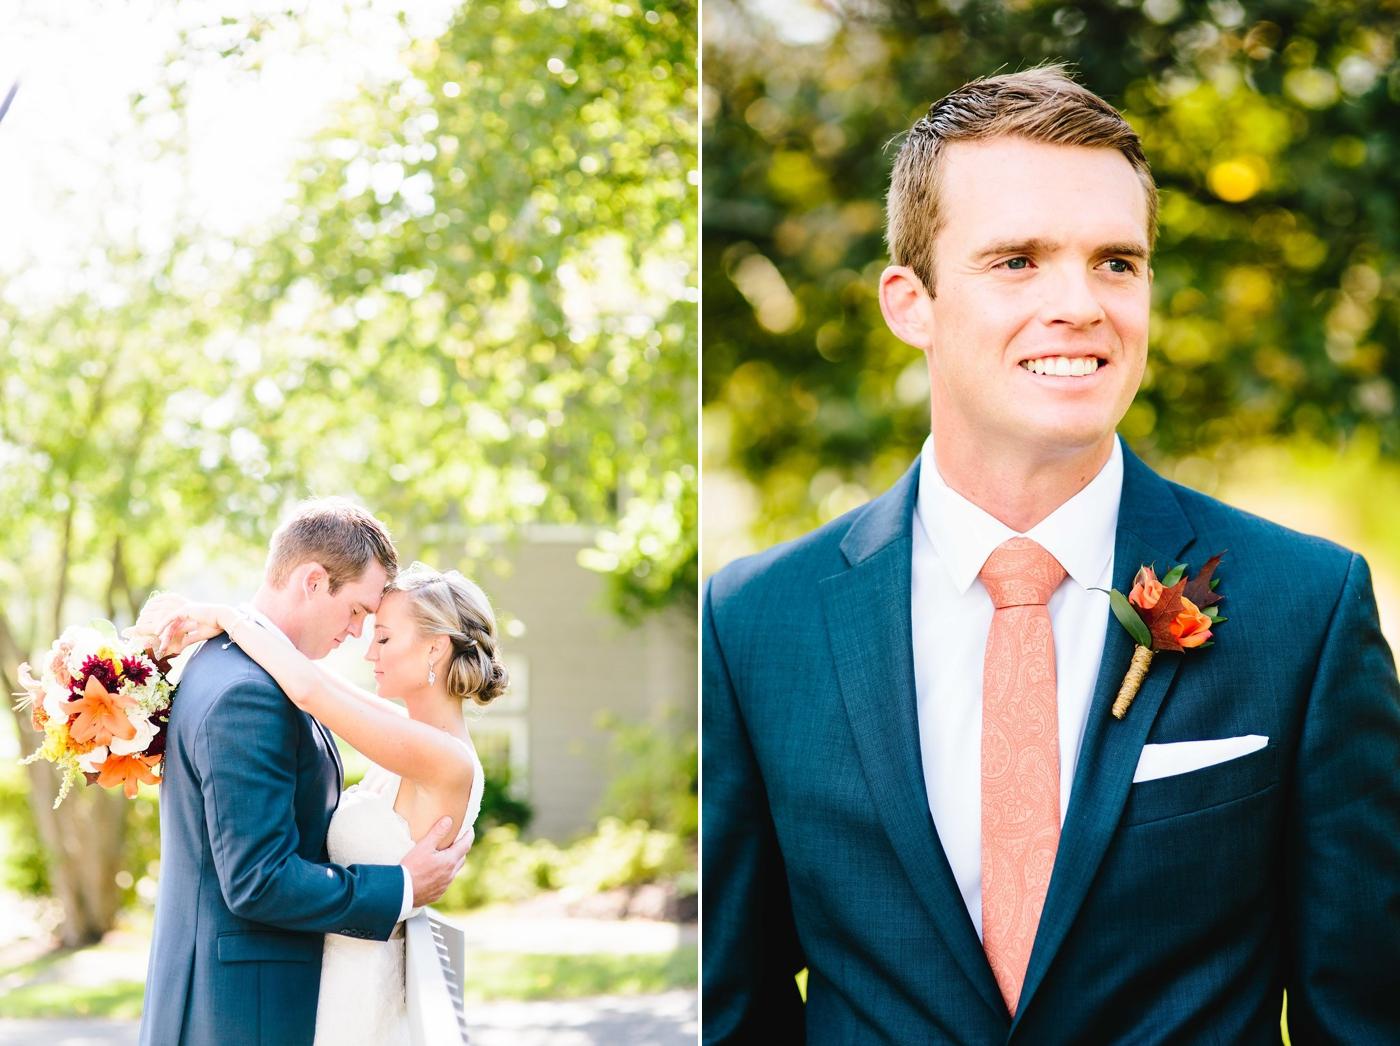 chicago-fine-art-wedding-photography-saylor33